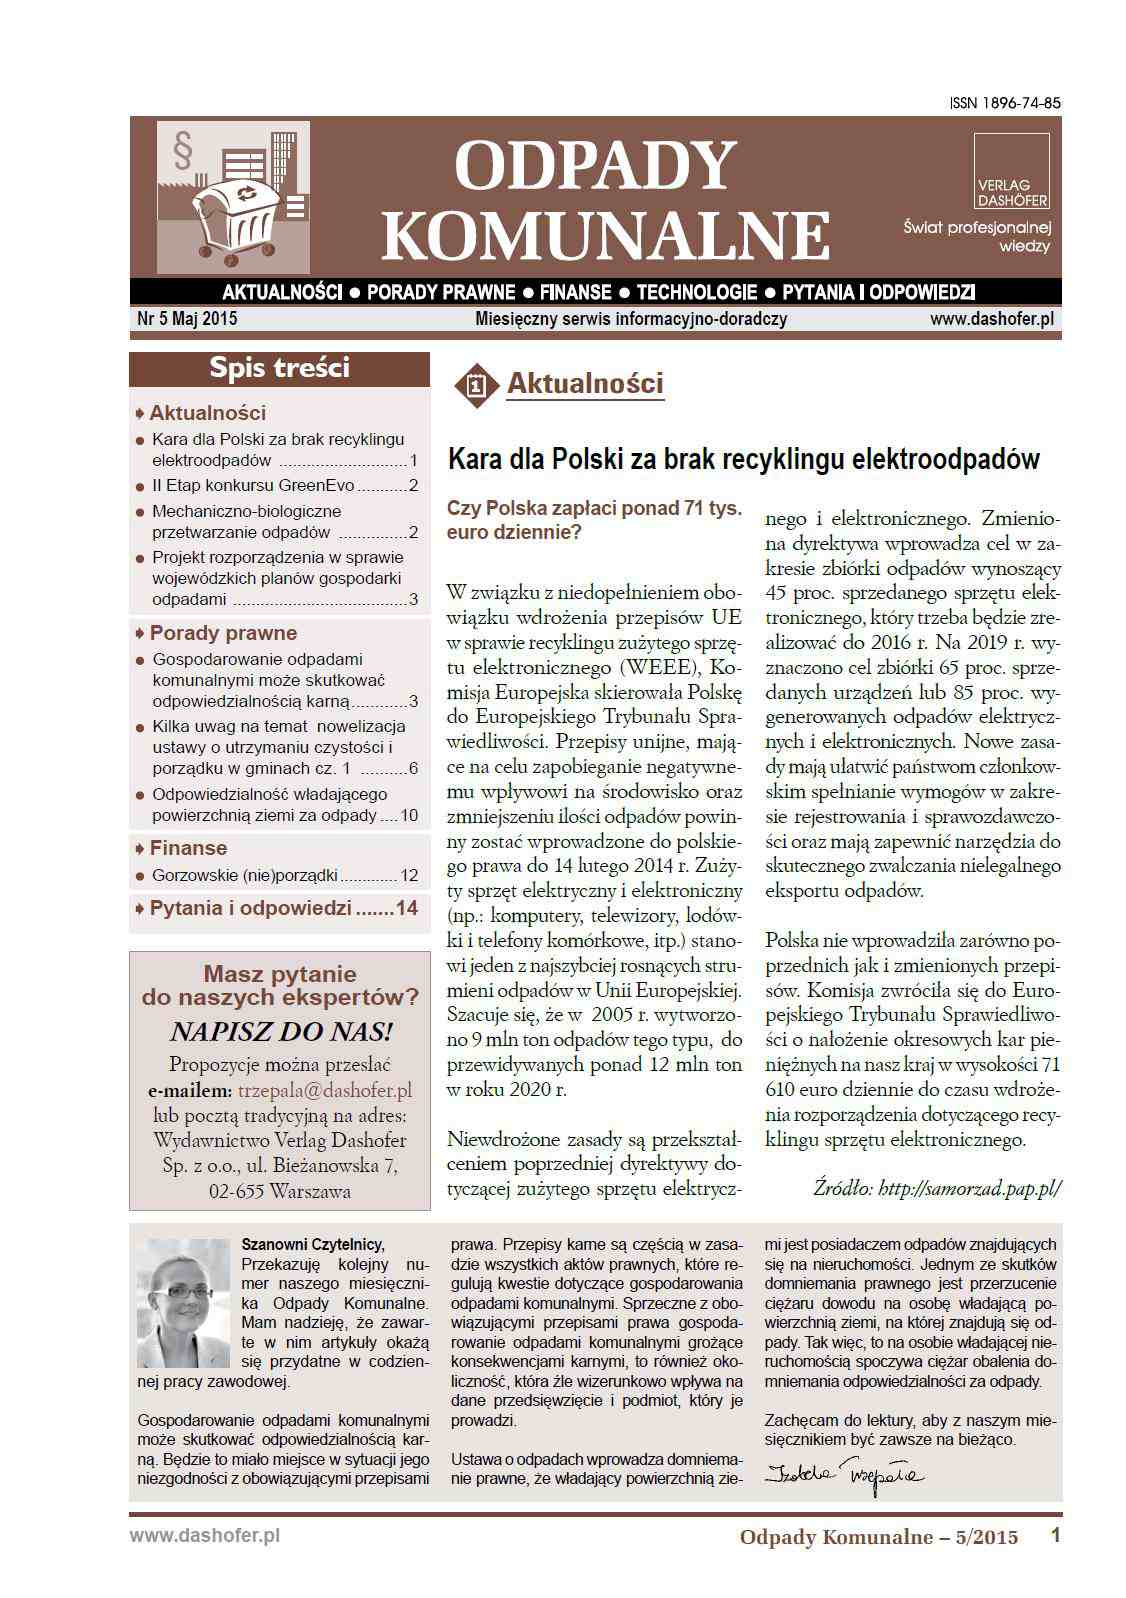 Odpady komunalne. Nr 5/2015 - Ebook (Książka PDF) do pobrania w formacie PDF